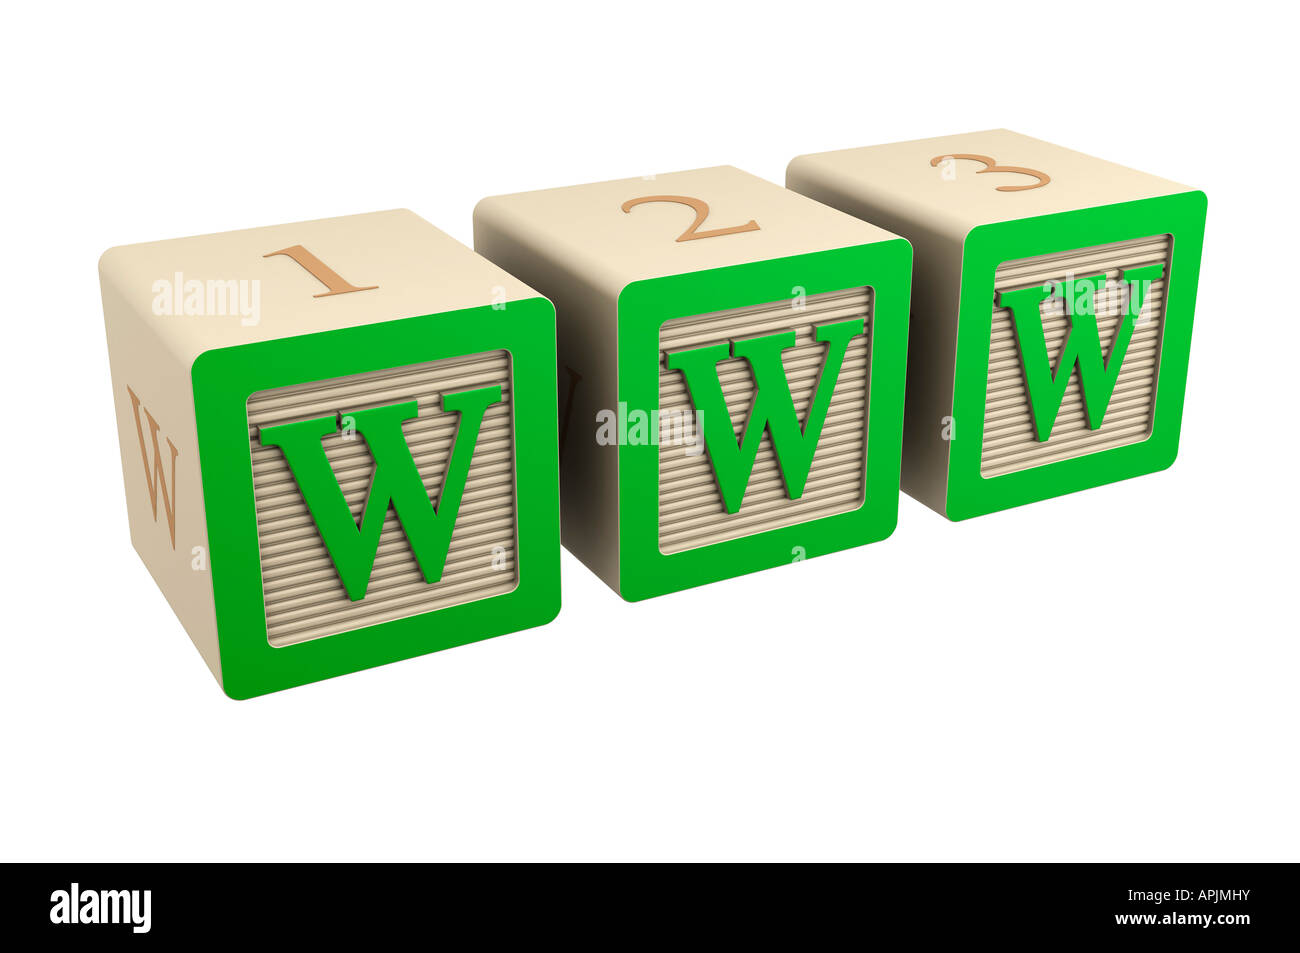 toy wooden block www internet green - Stock Image